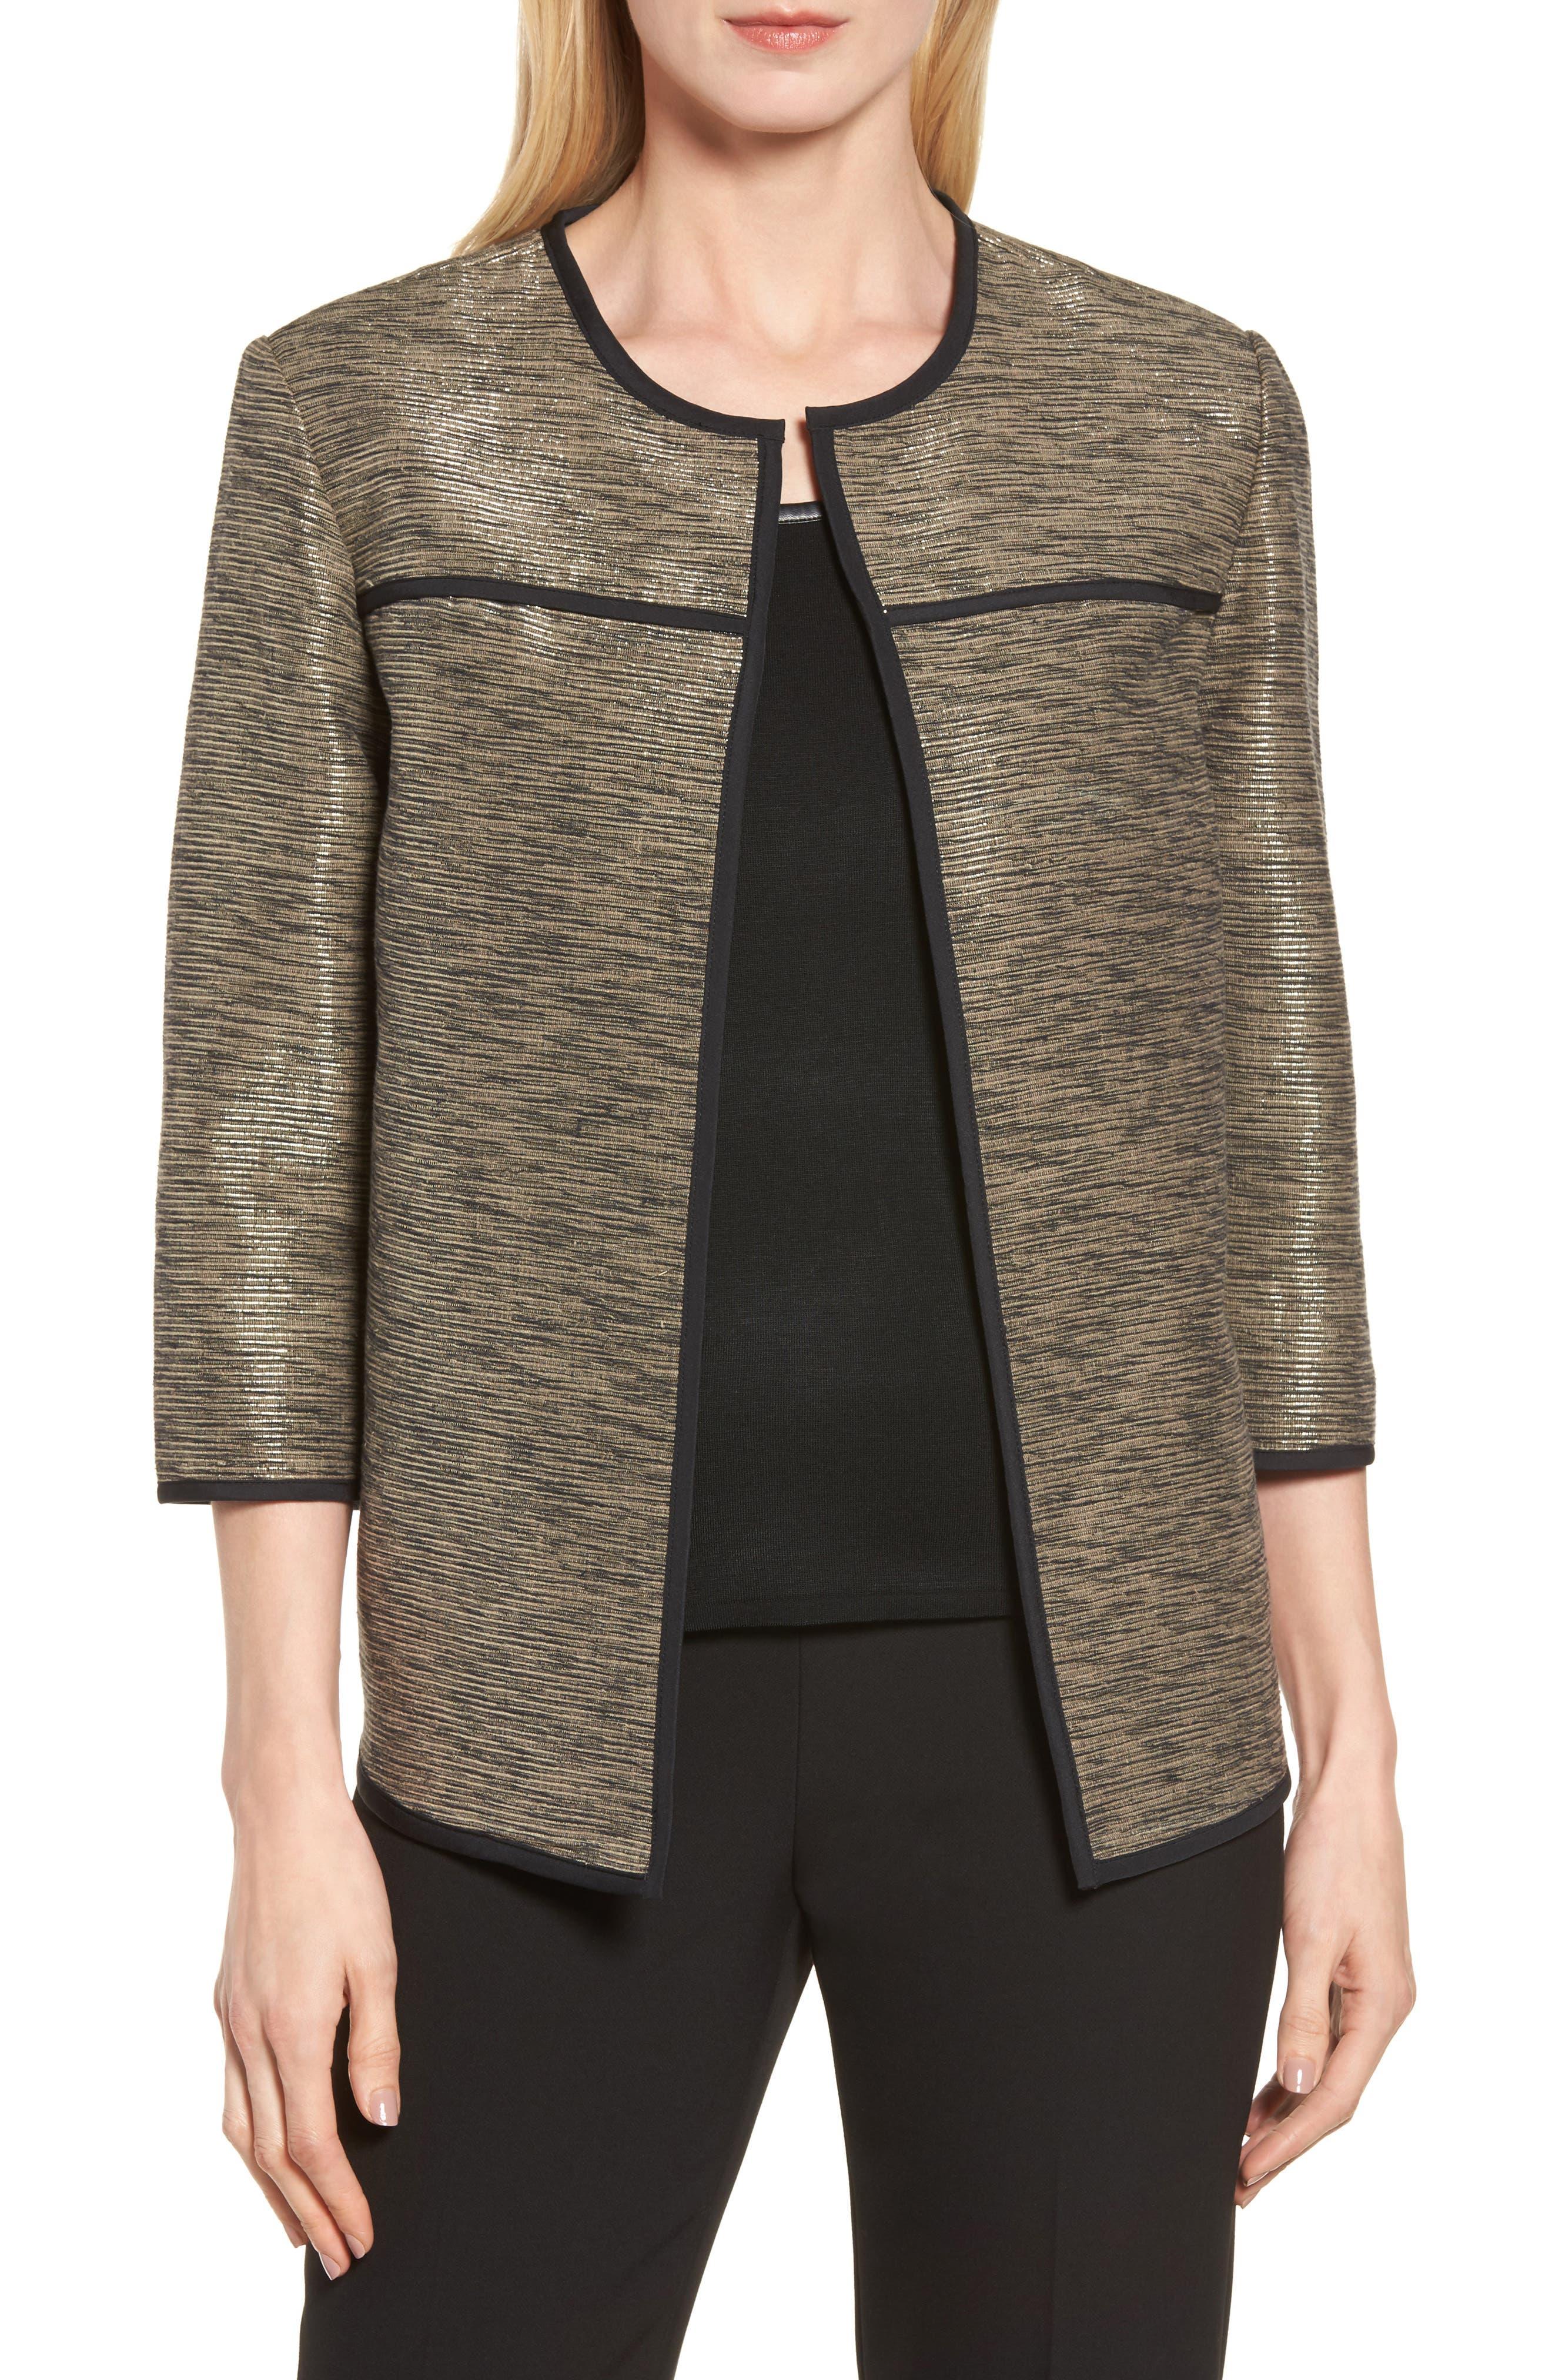 Ming Wang Metallic Tweed Jacket